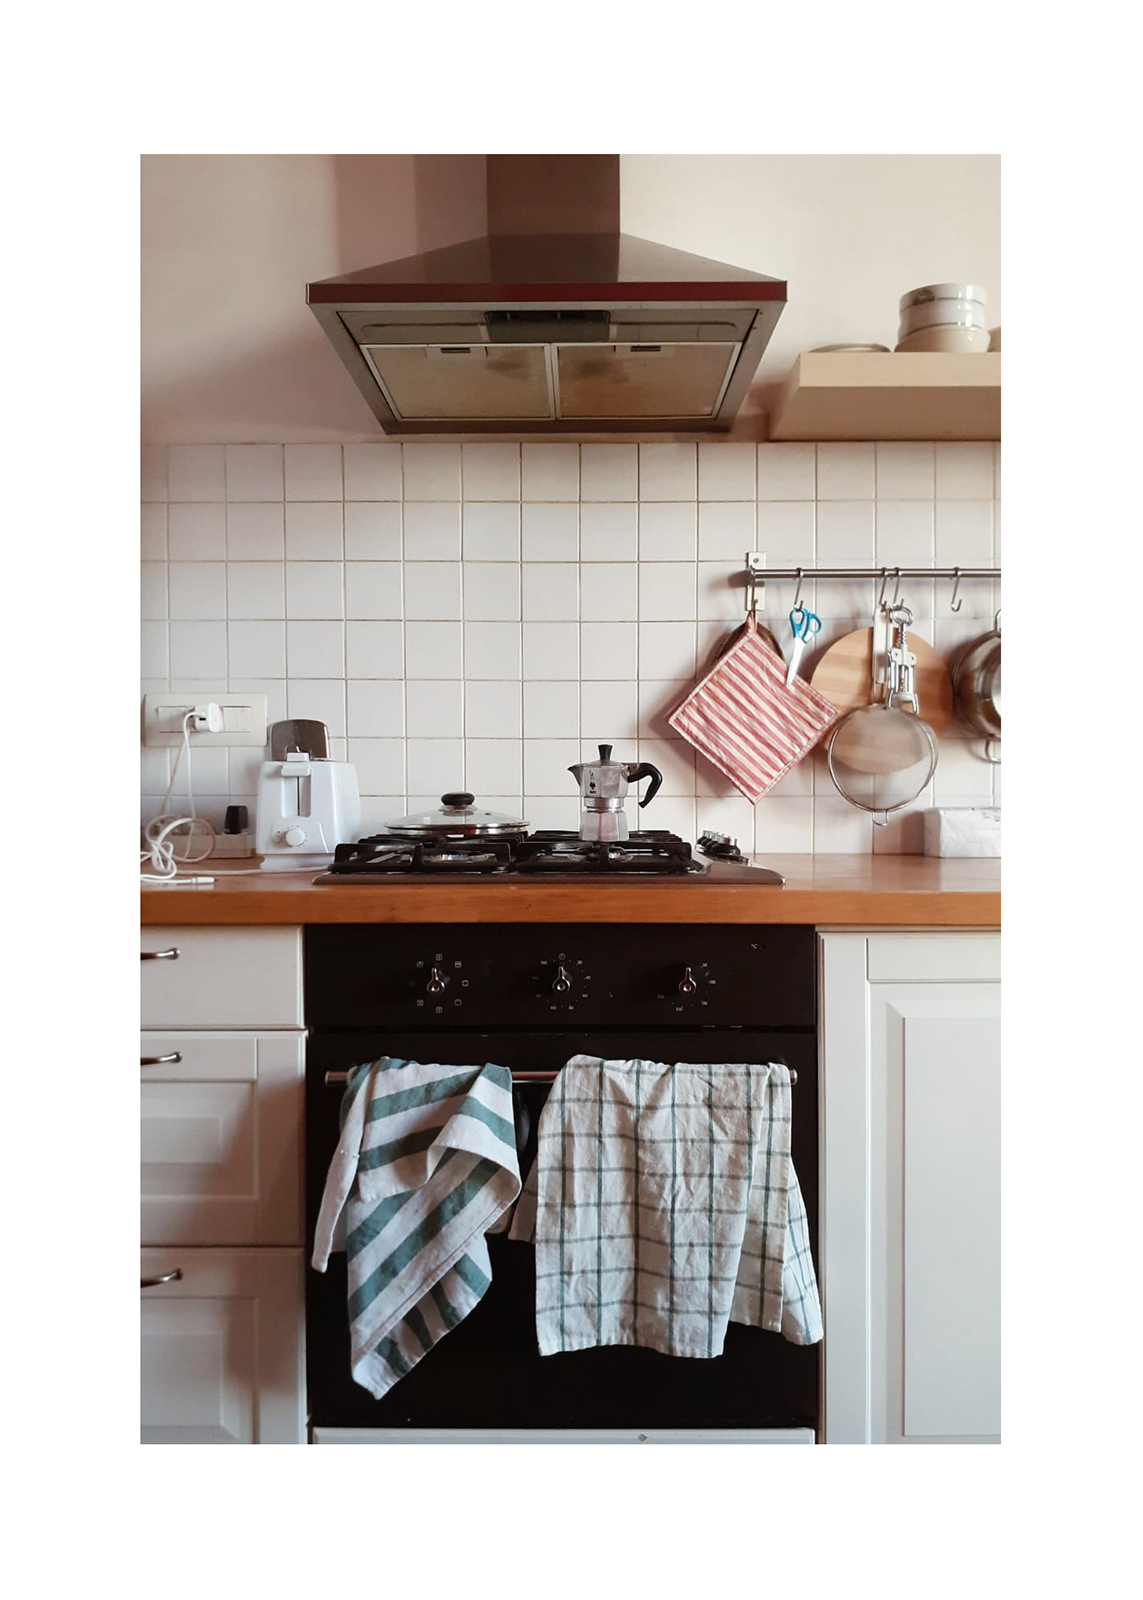 paola ressa cucine 4